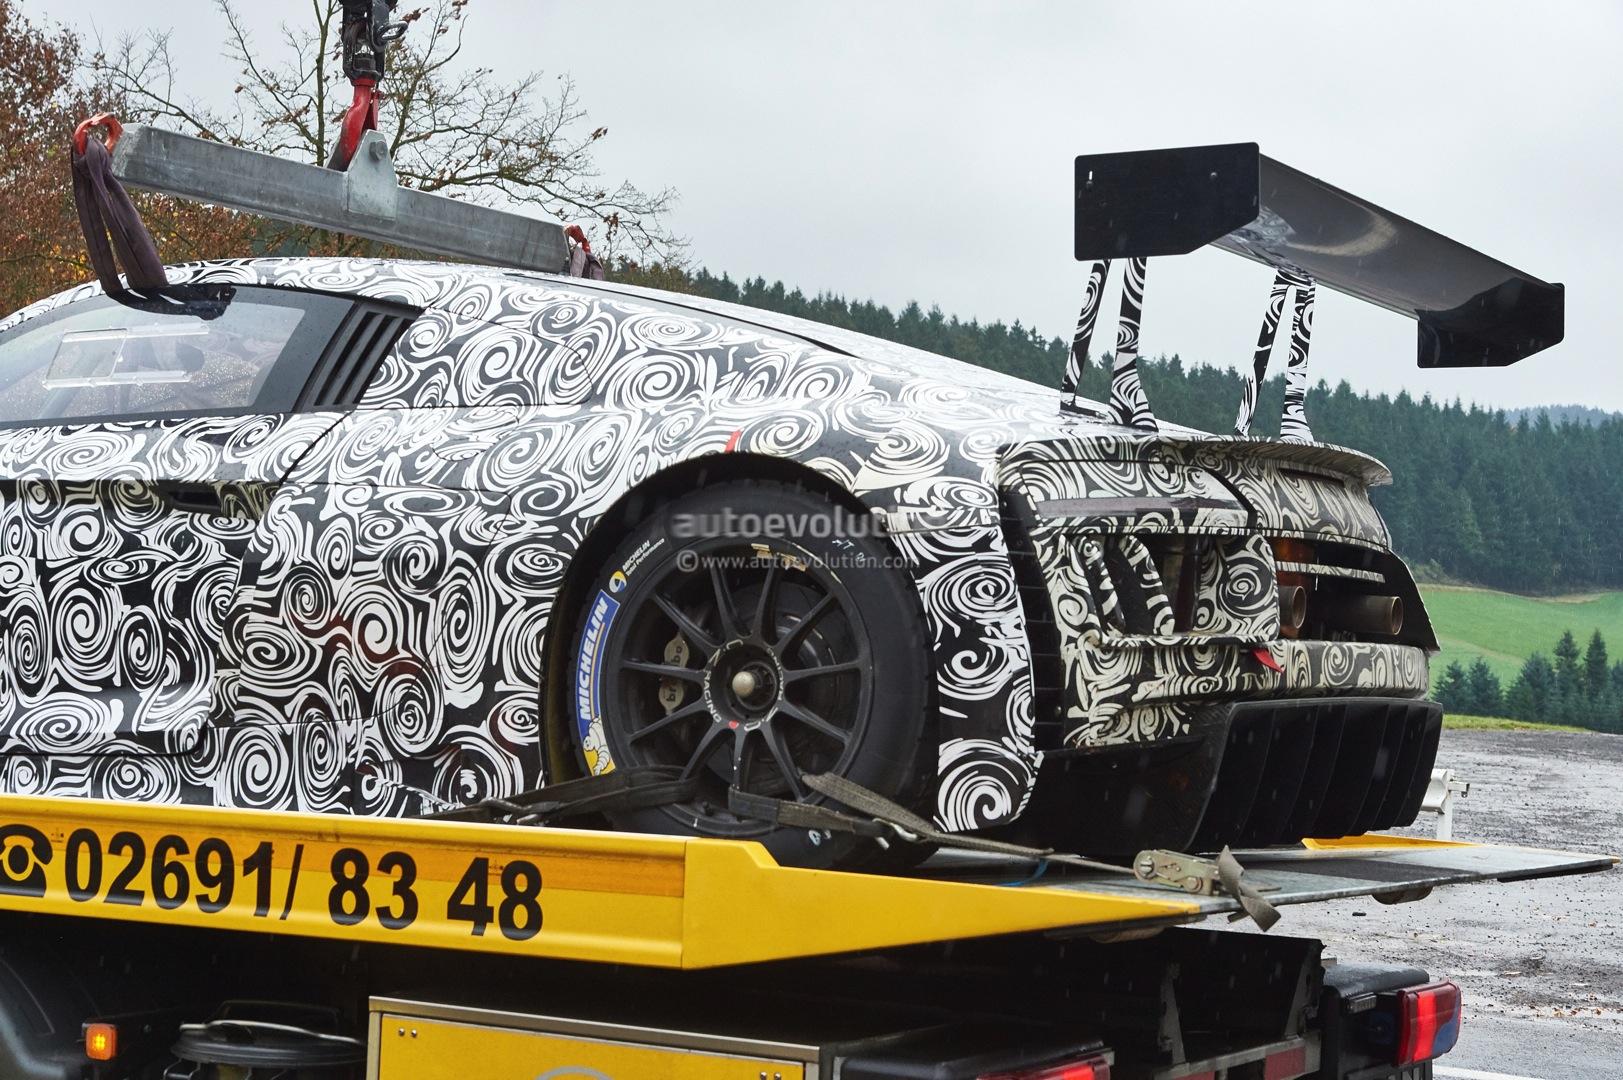 Spyshots: Next-Gen 2015 Audi R8 LMS Ultra Racer Breaks Down - autoevolution